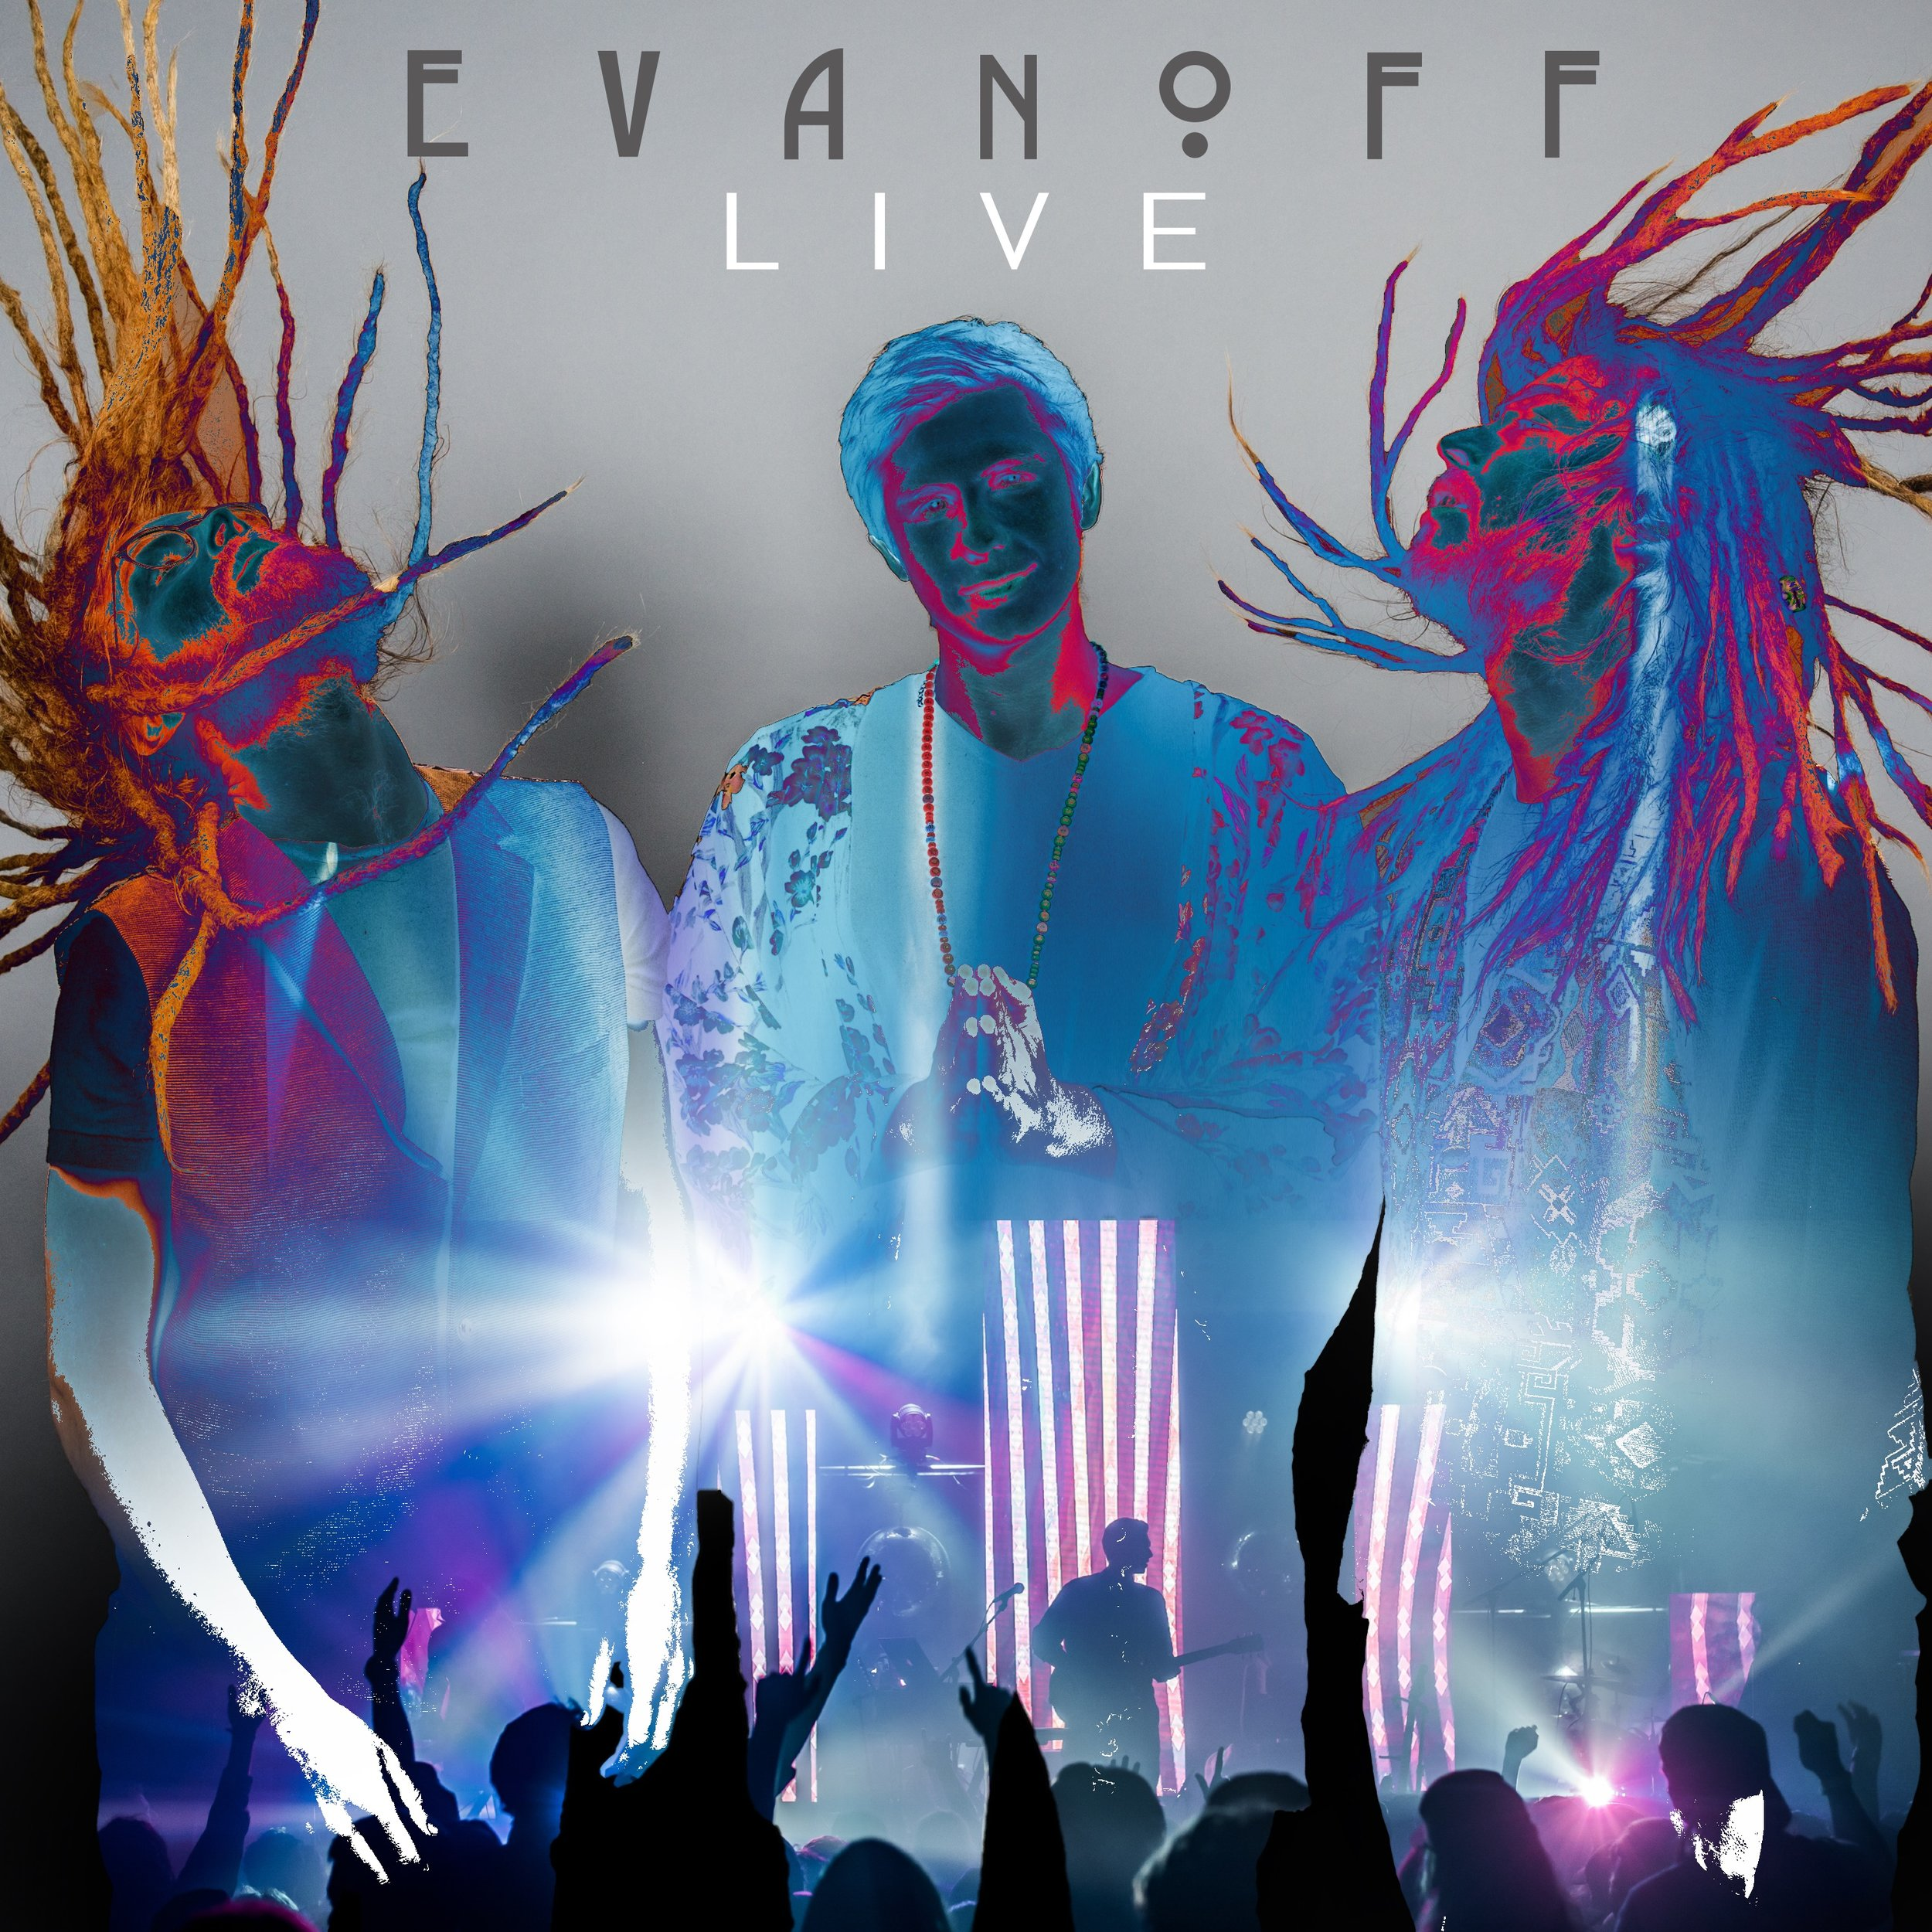 Evanoff Live Album Cover.jpg